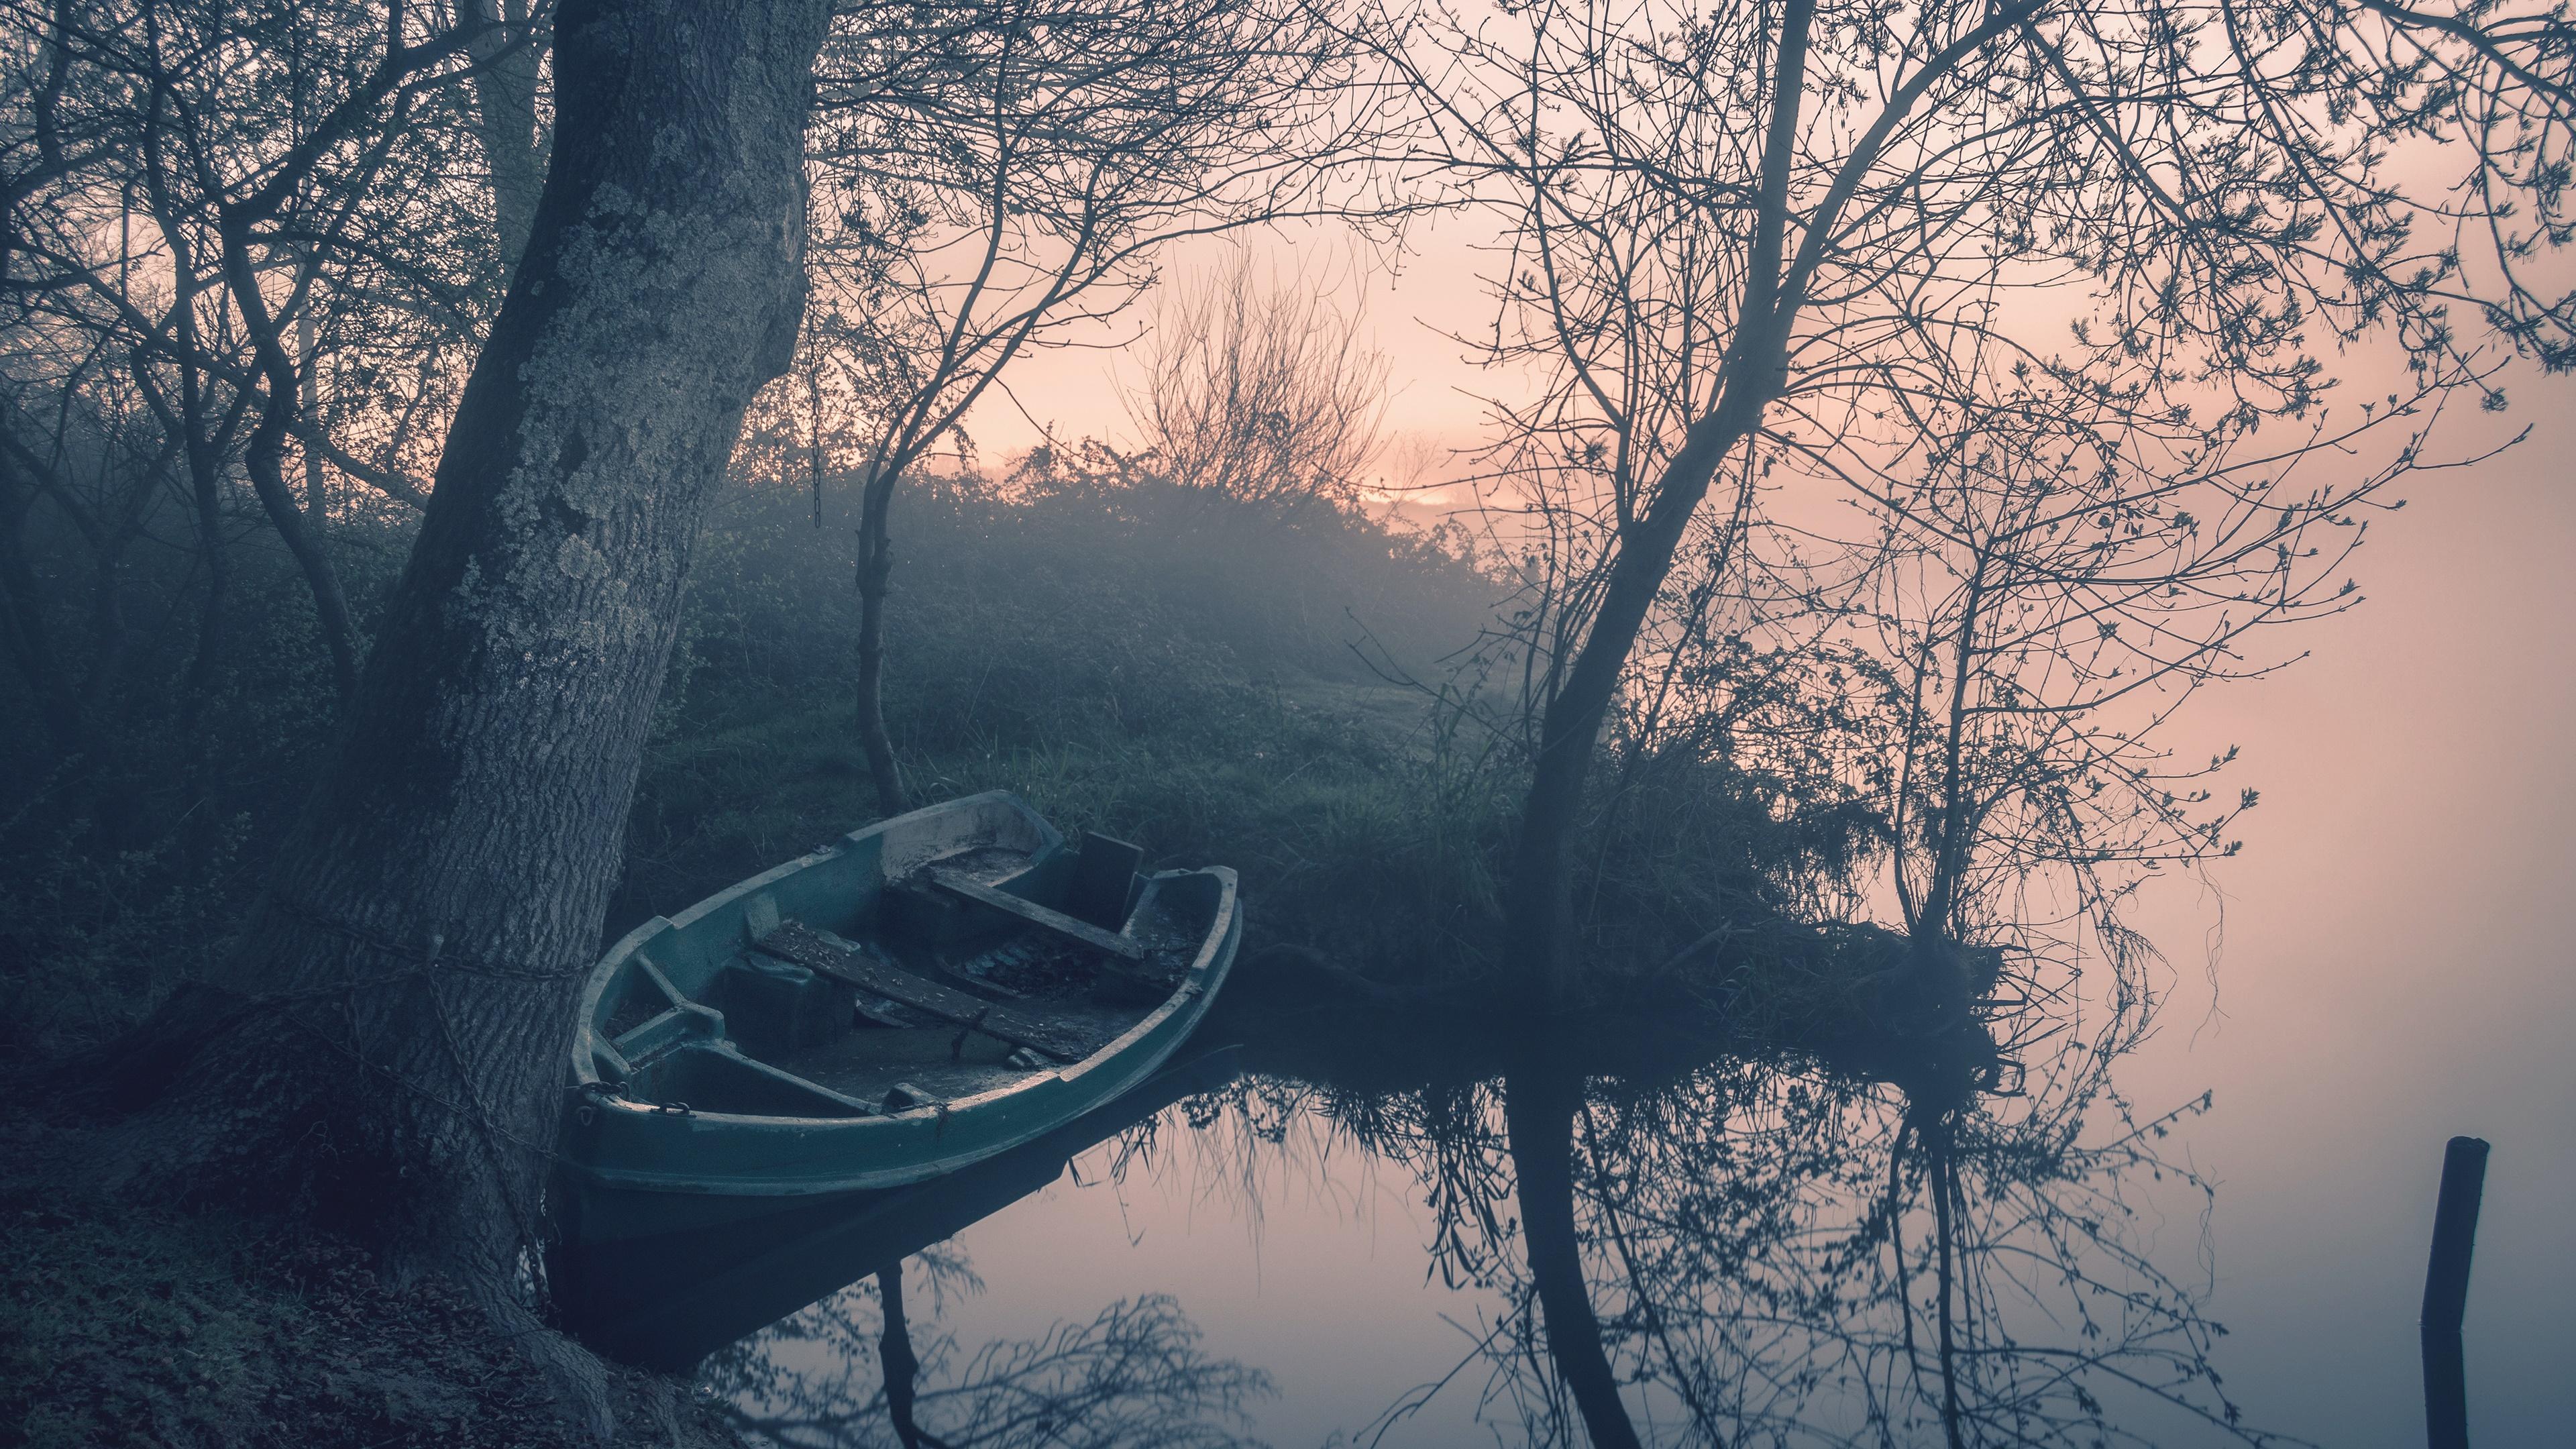 Lakeside on a misty dawn wallpaper